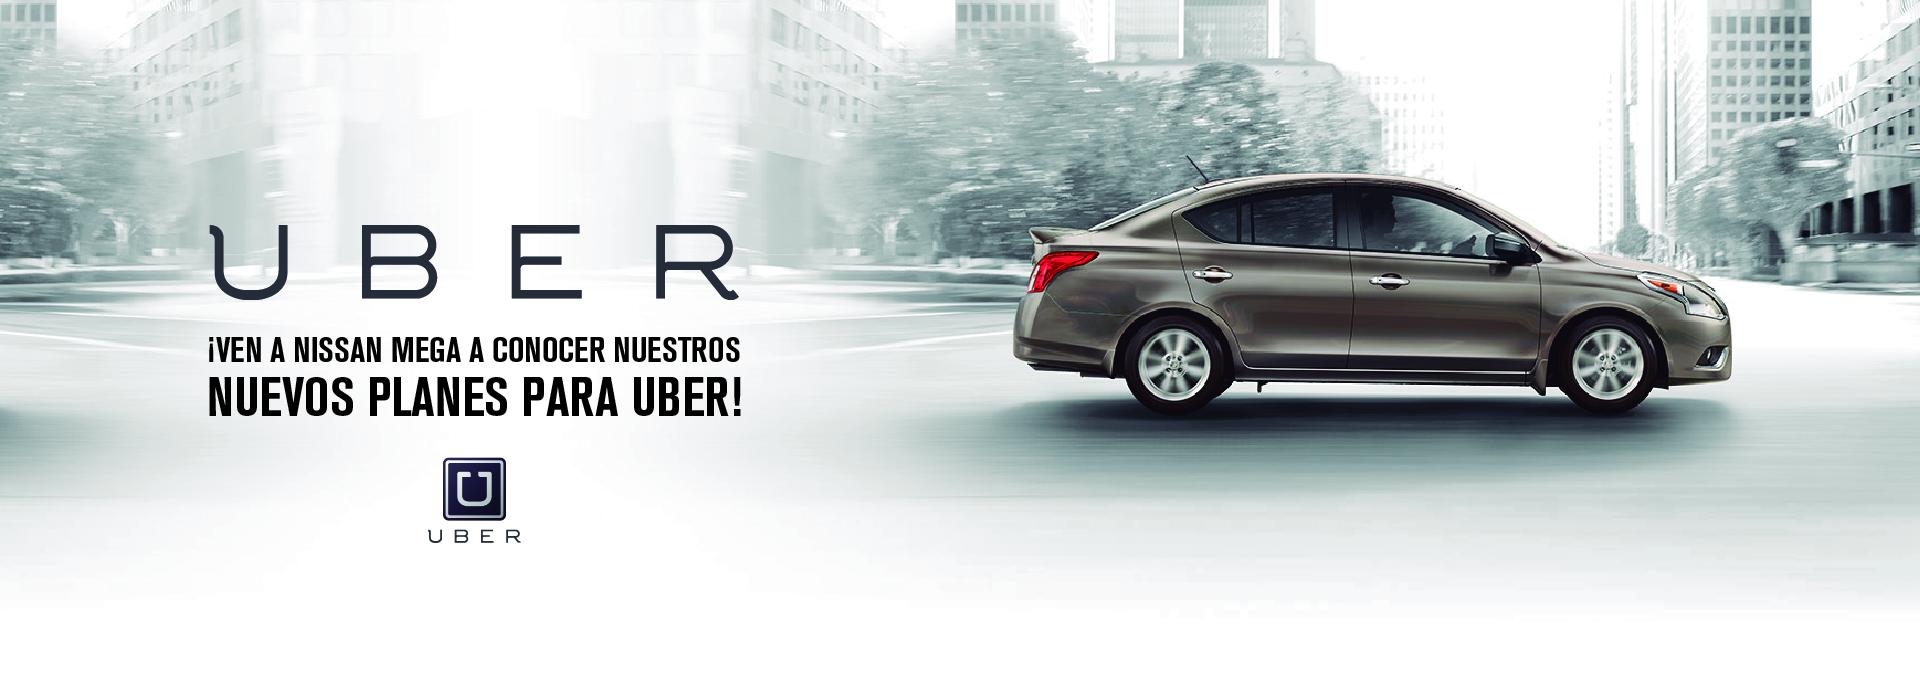 Estrena Nissan Uber Toluca Metepec San mateo Zinacantepec